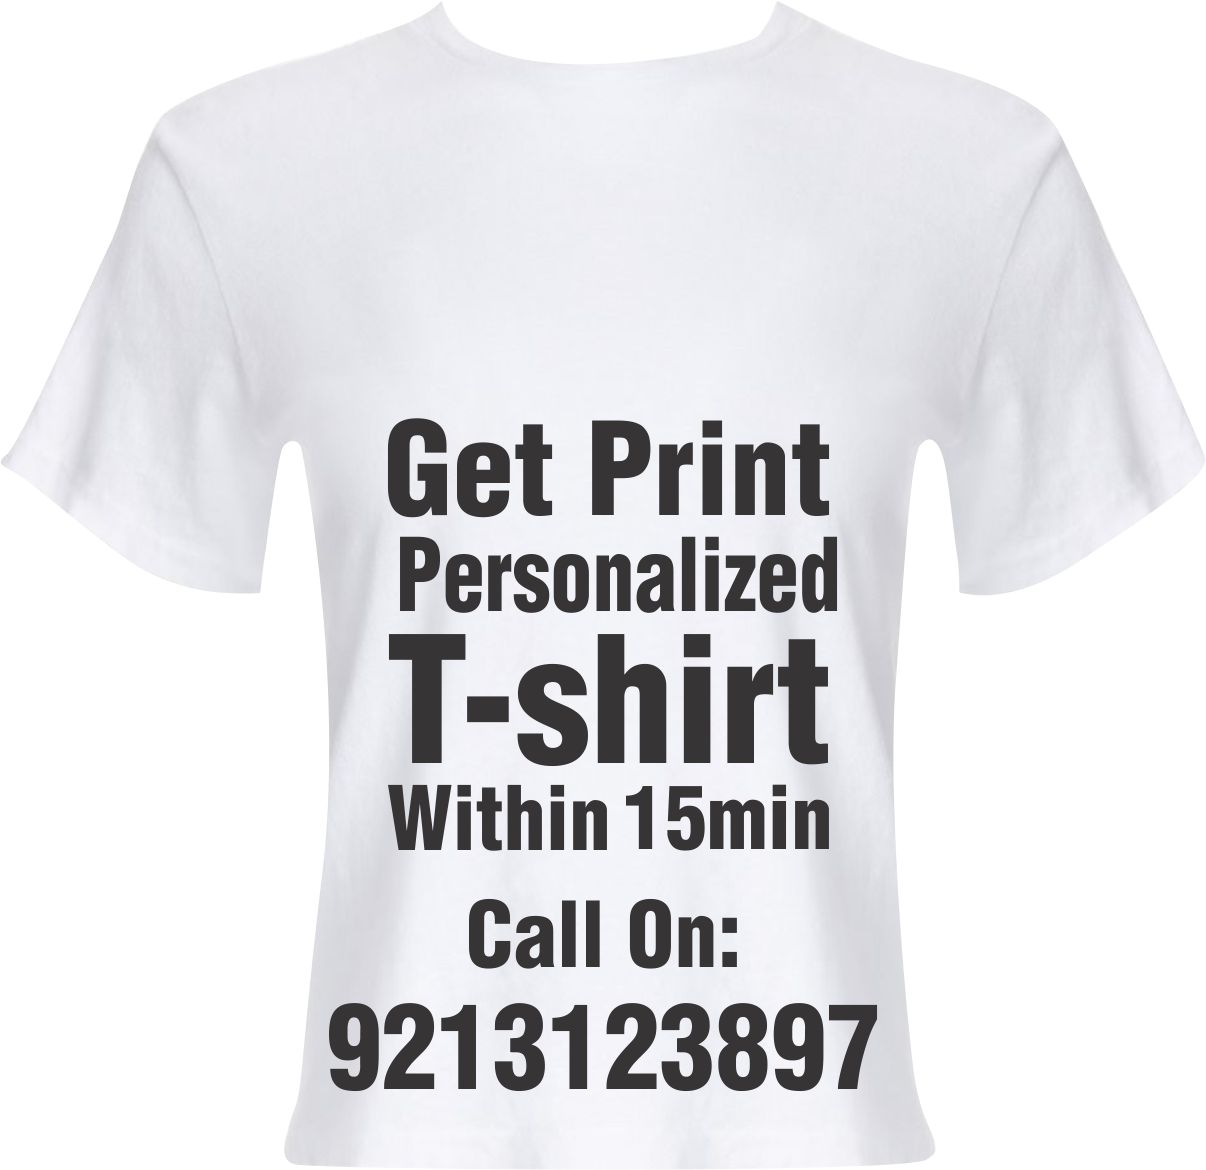 T-Shirt Printing in Munirka Delhi NCR India